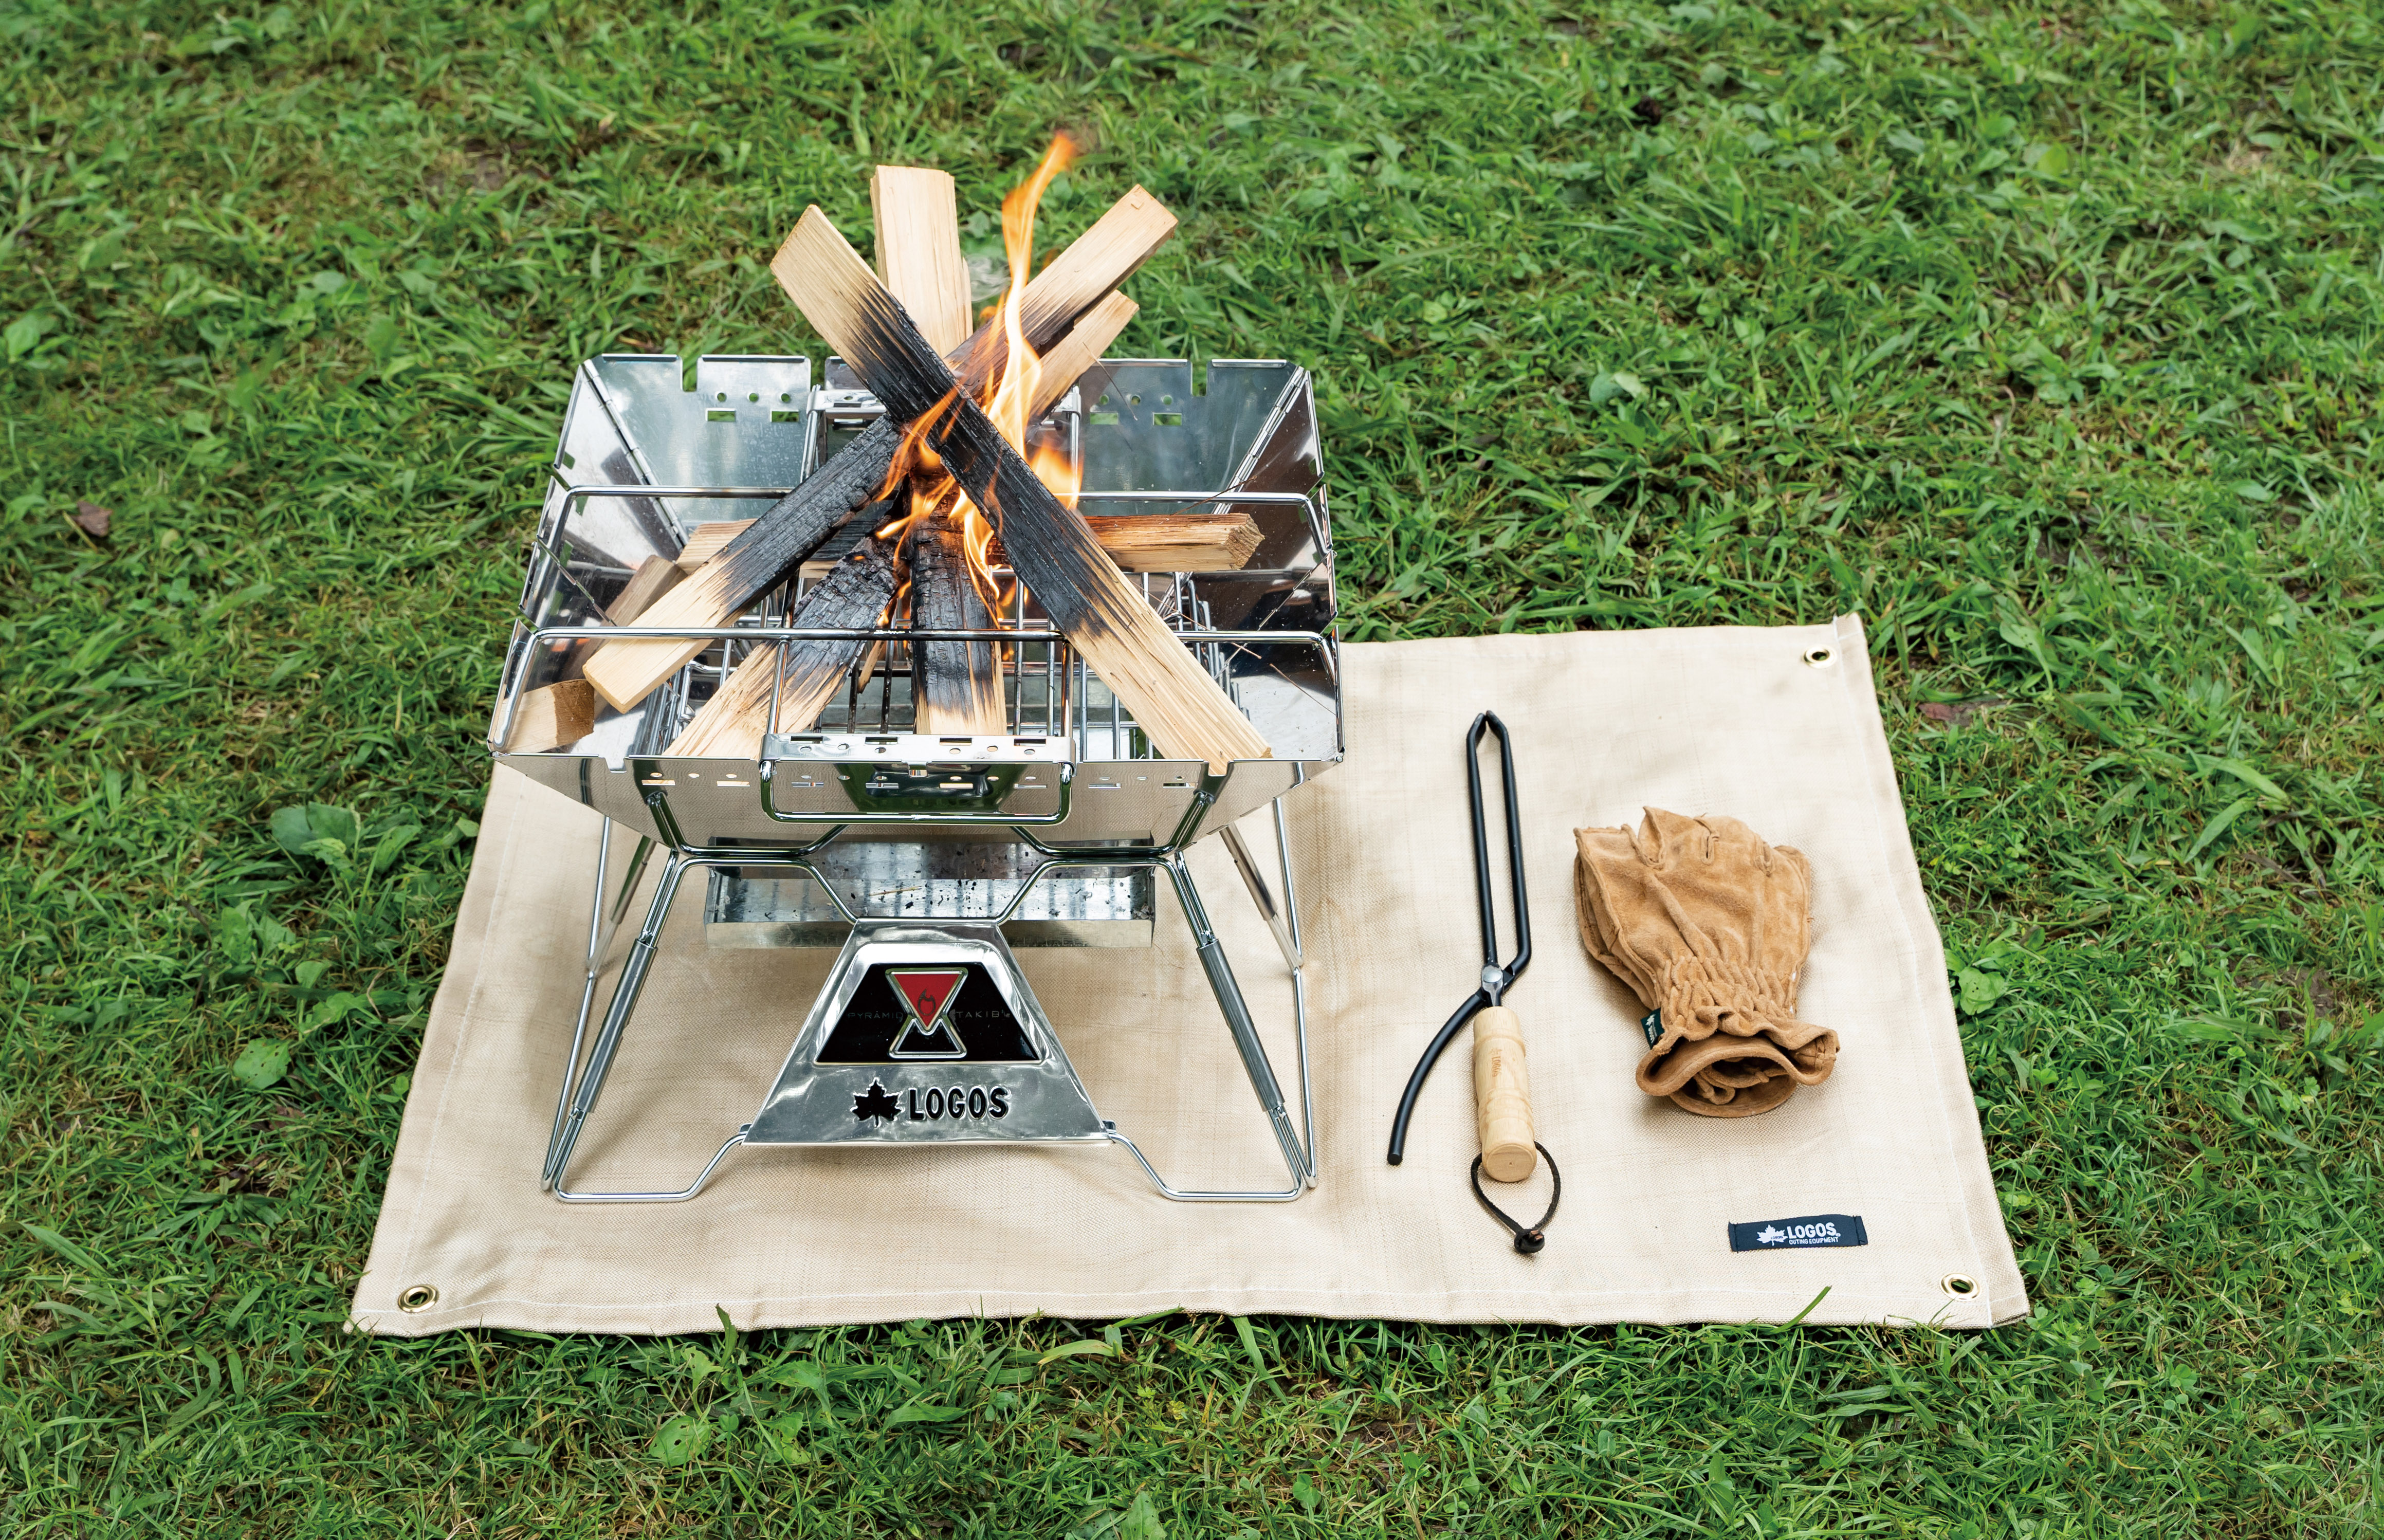 LOGOS、灰や火の粉から芝生を守る耐熱温度500℃の耐火シート「たき火台シート」新発売